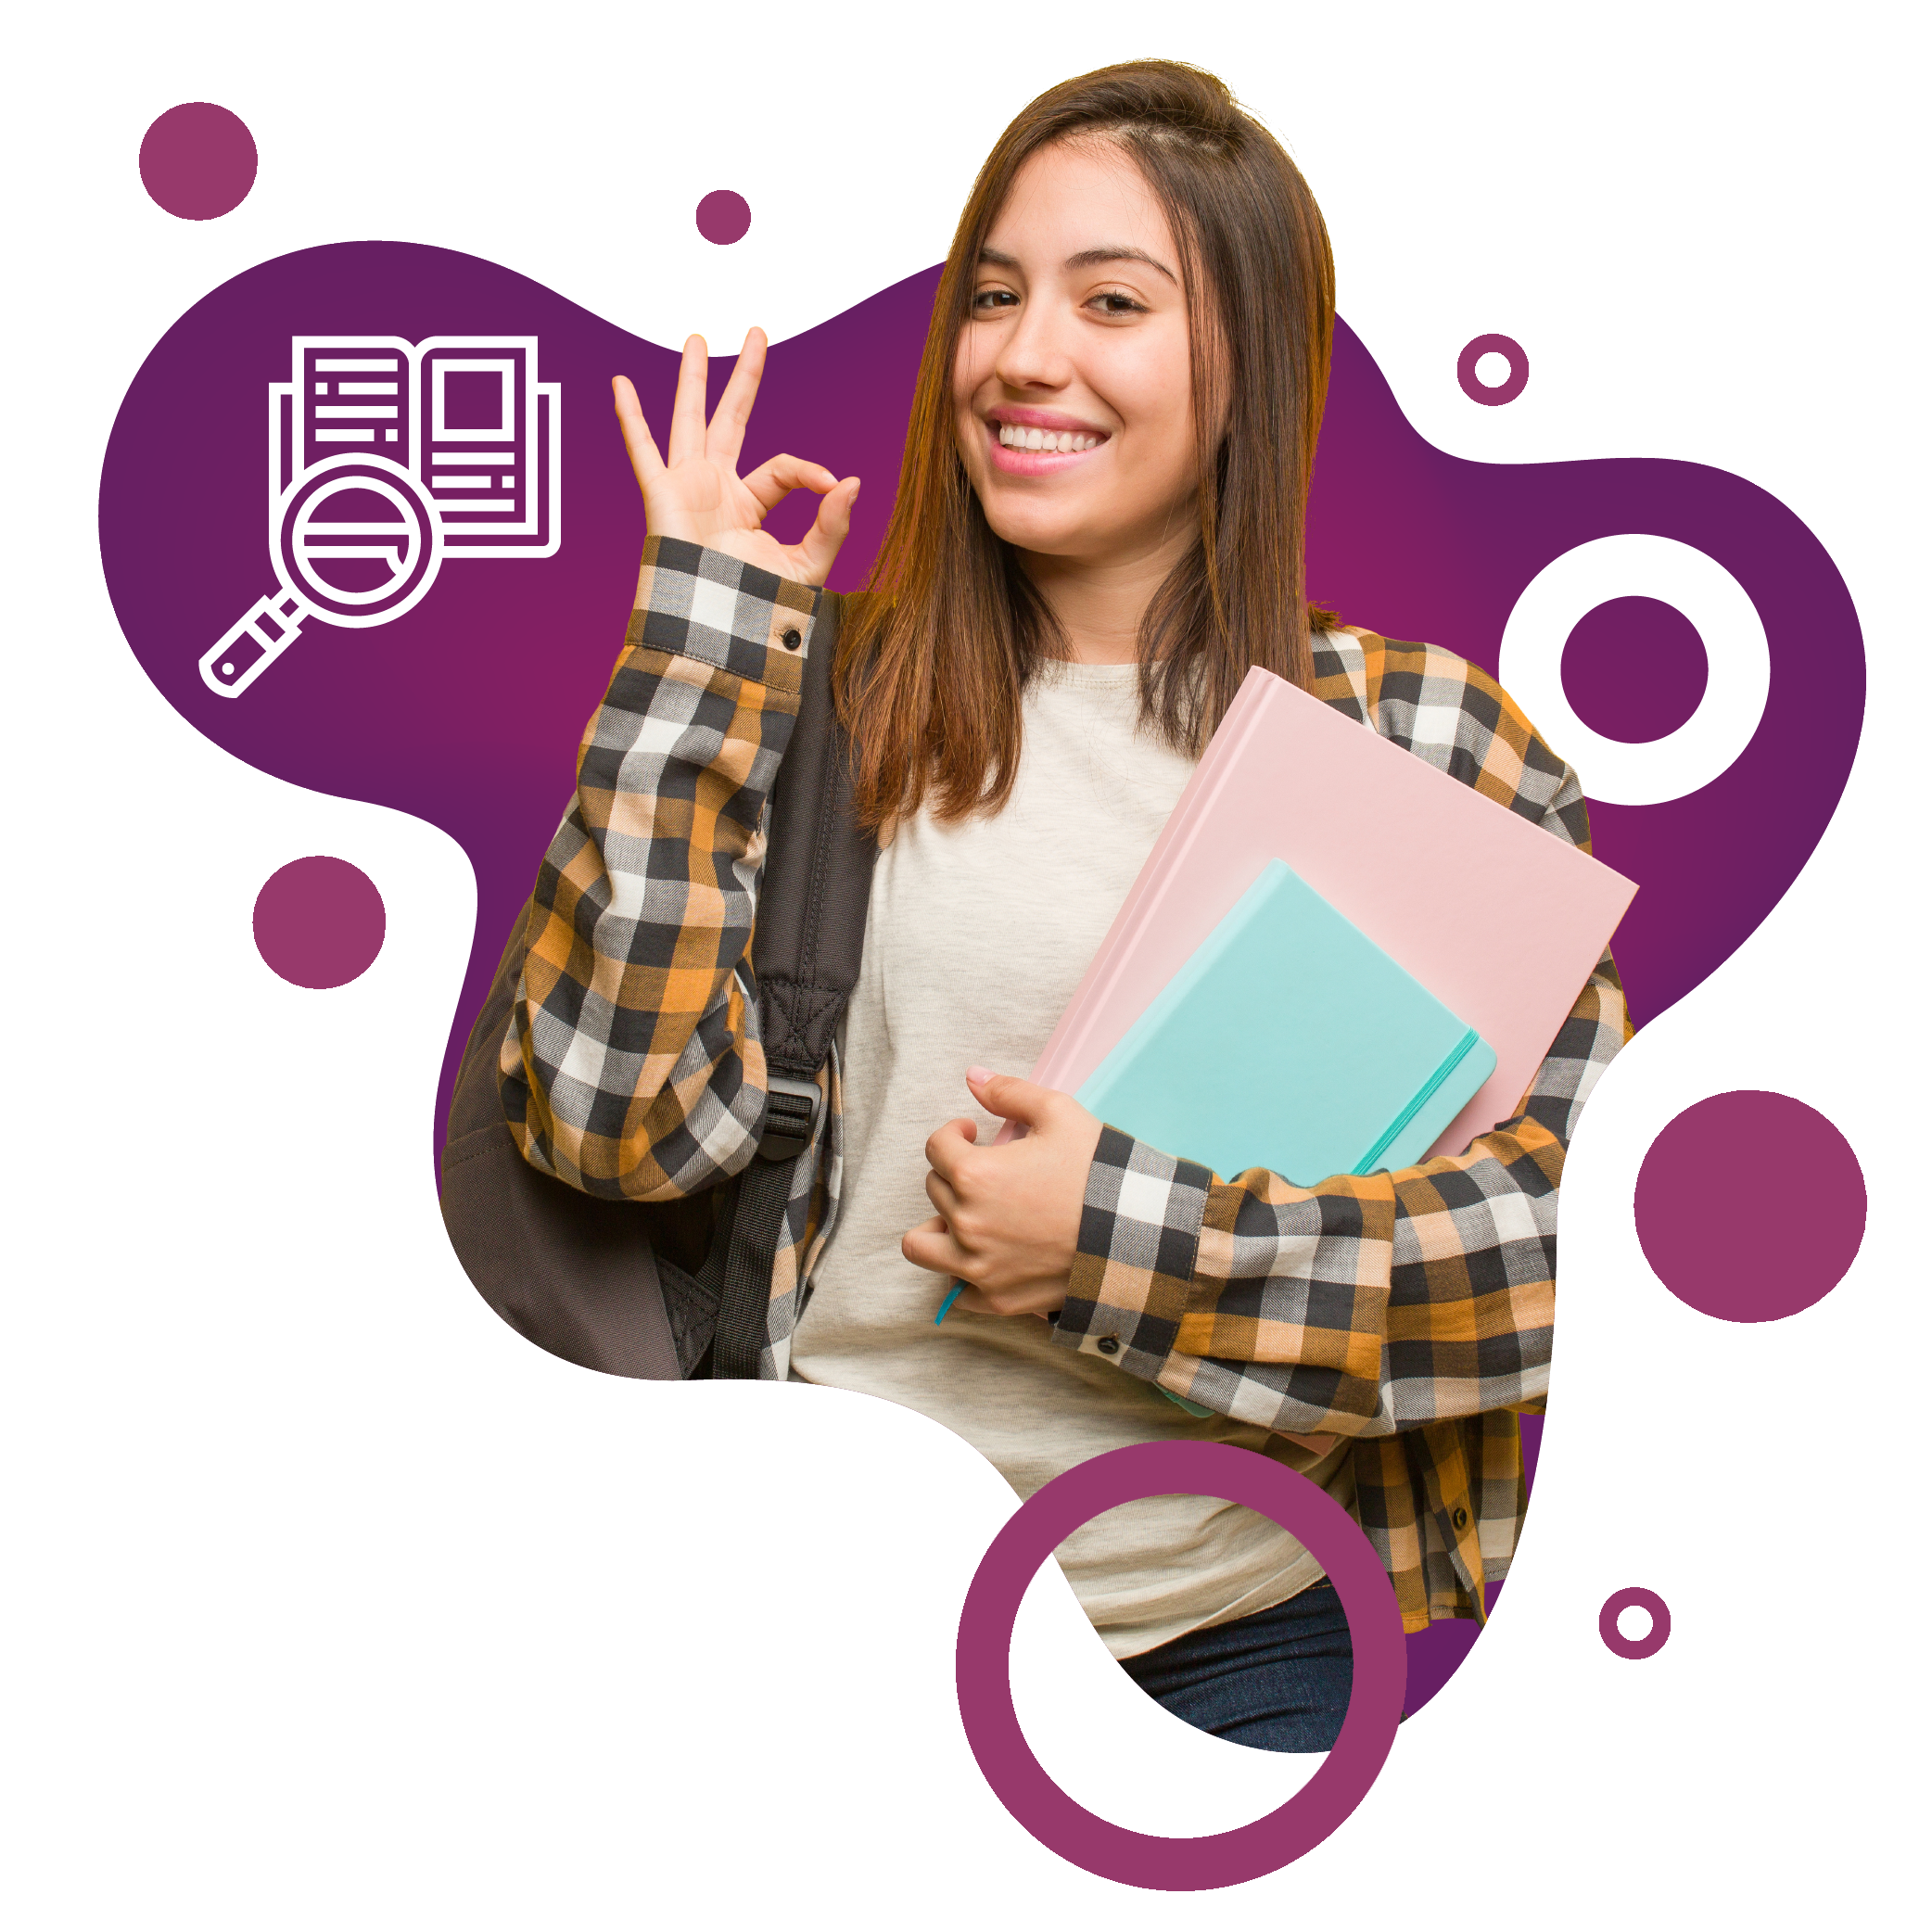 10-SN-Website-Menu-Section_S1tudent-Visa-1.png